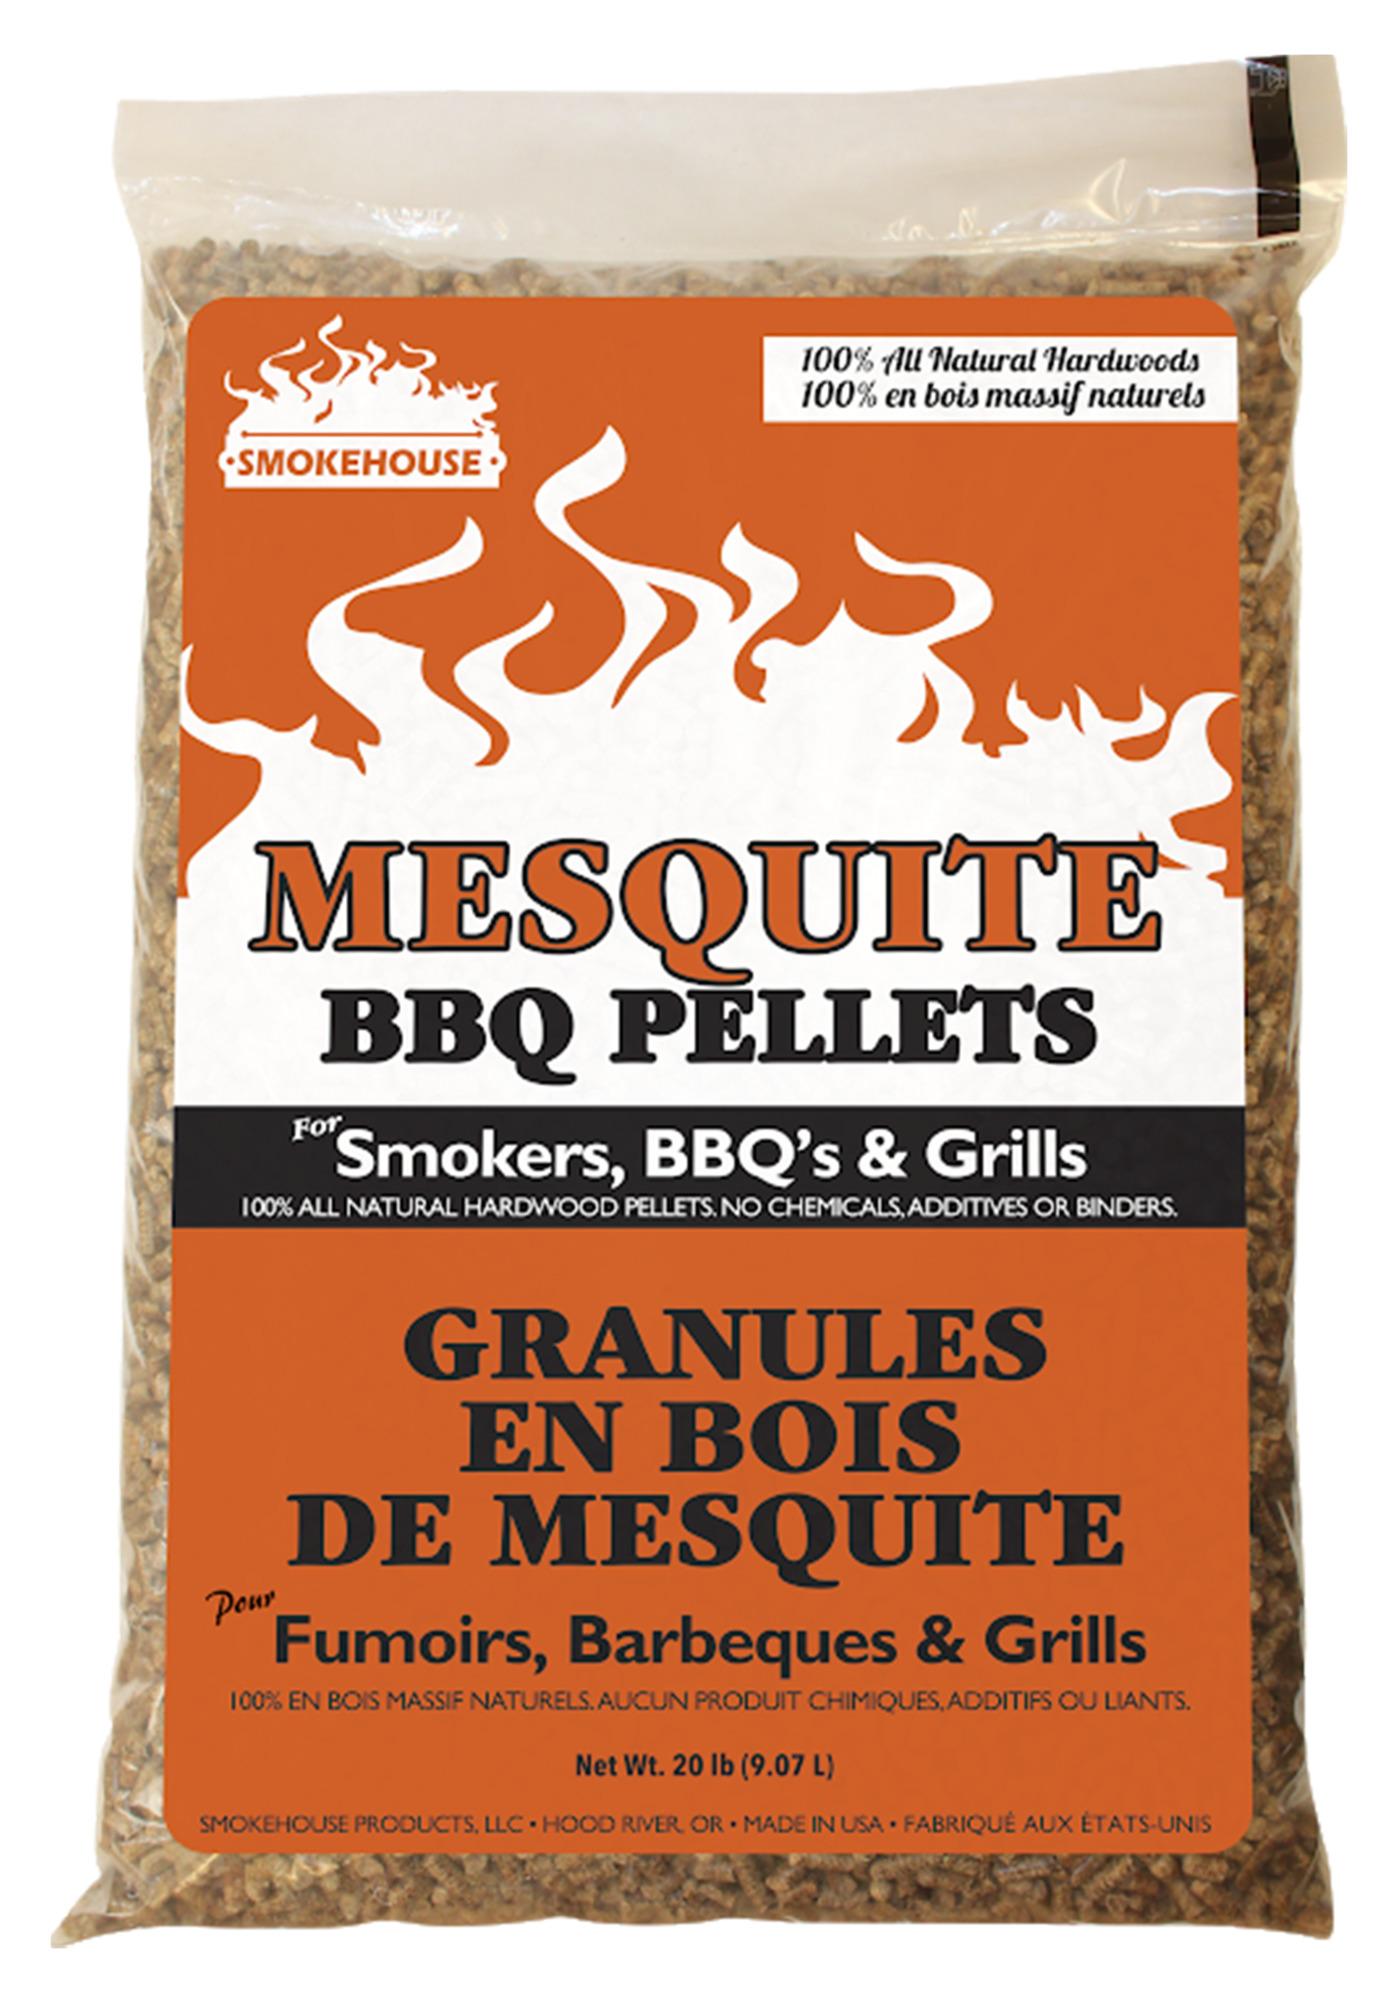 Smokehouse BBQ Pellets 20lb Bag Mesquite